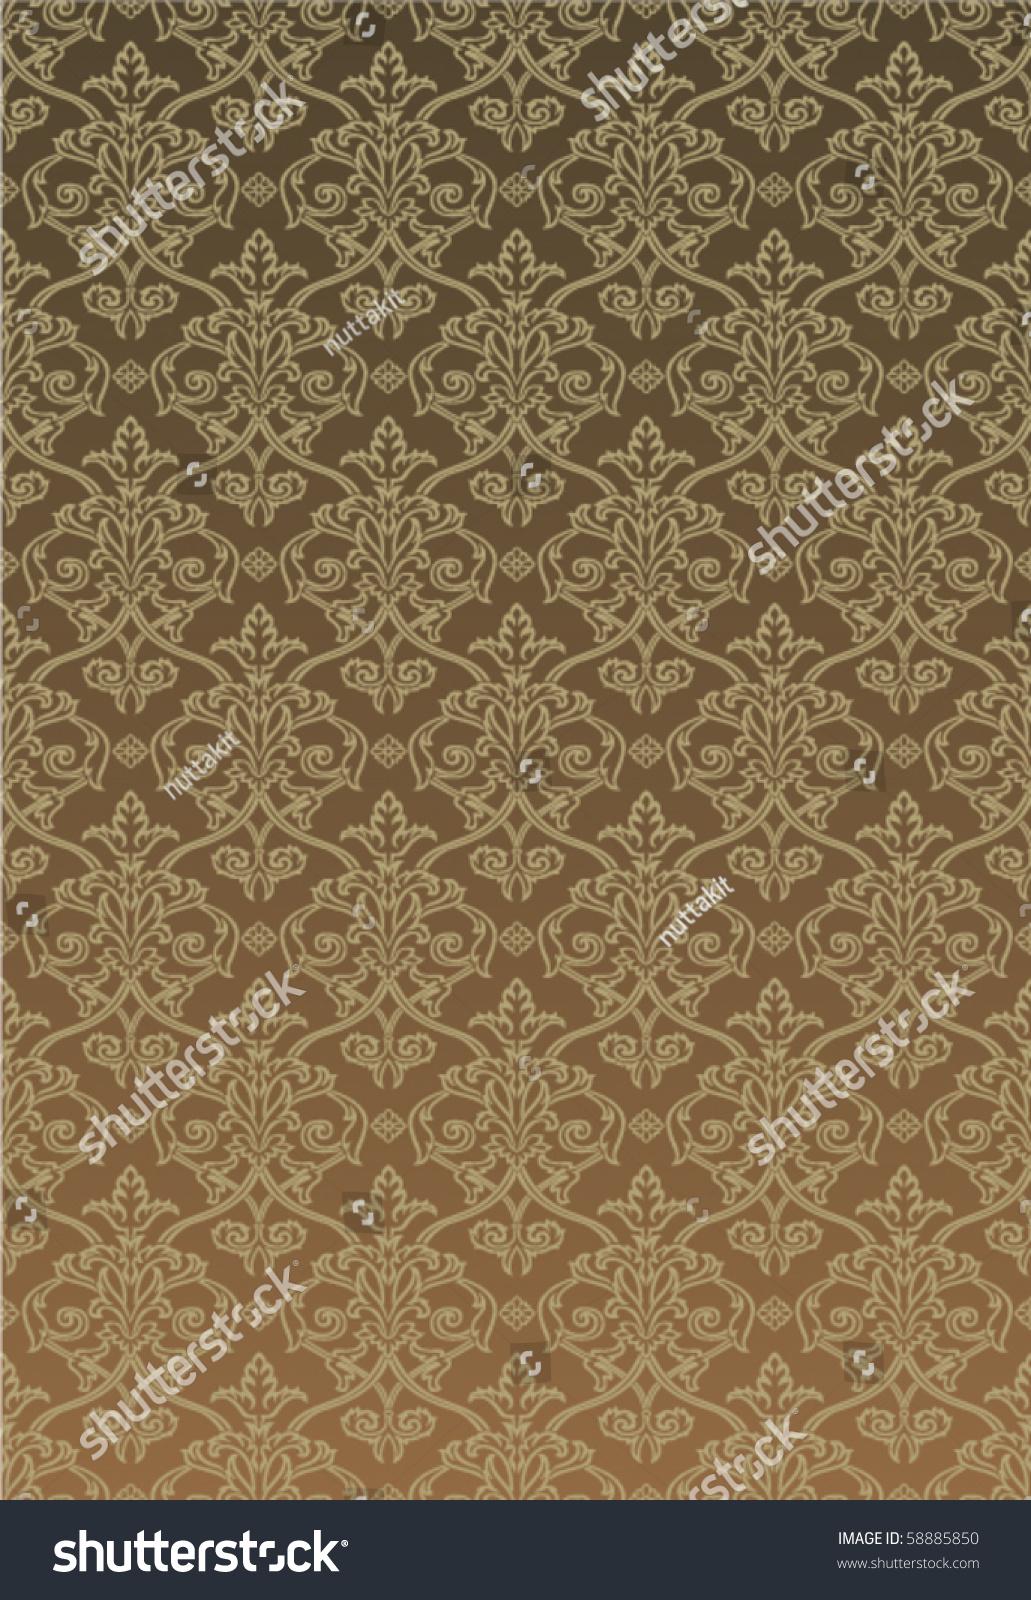 brown tone damask style - photo #2